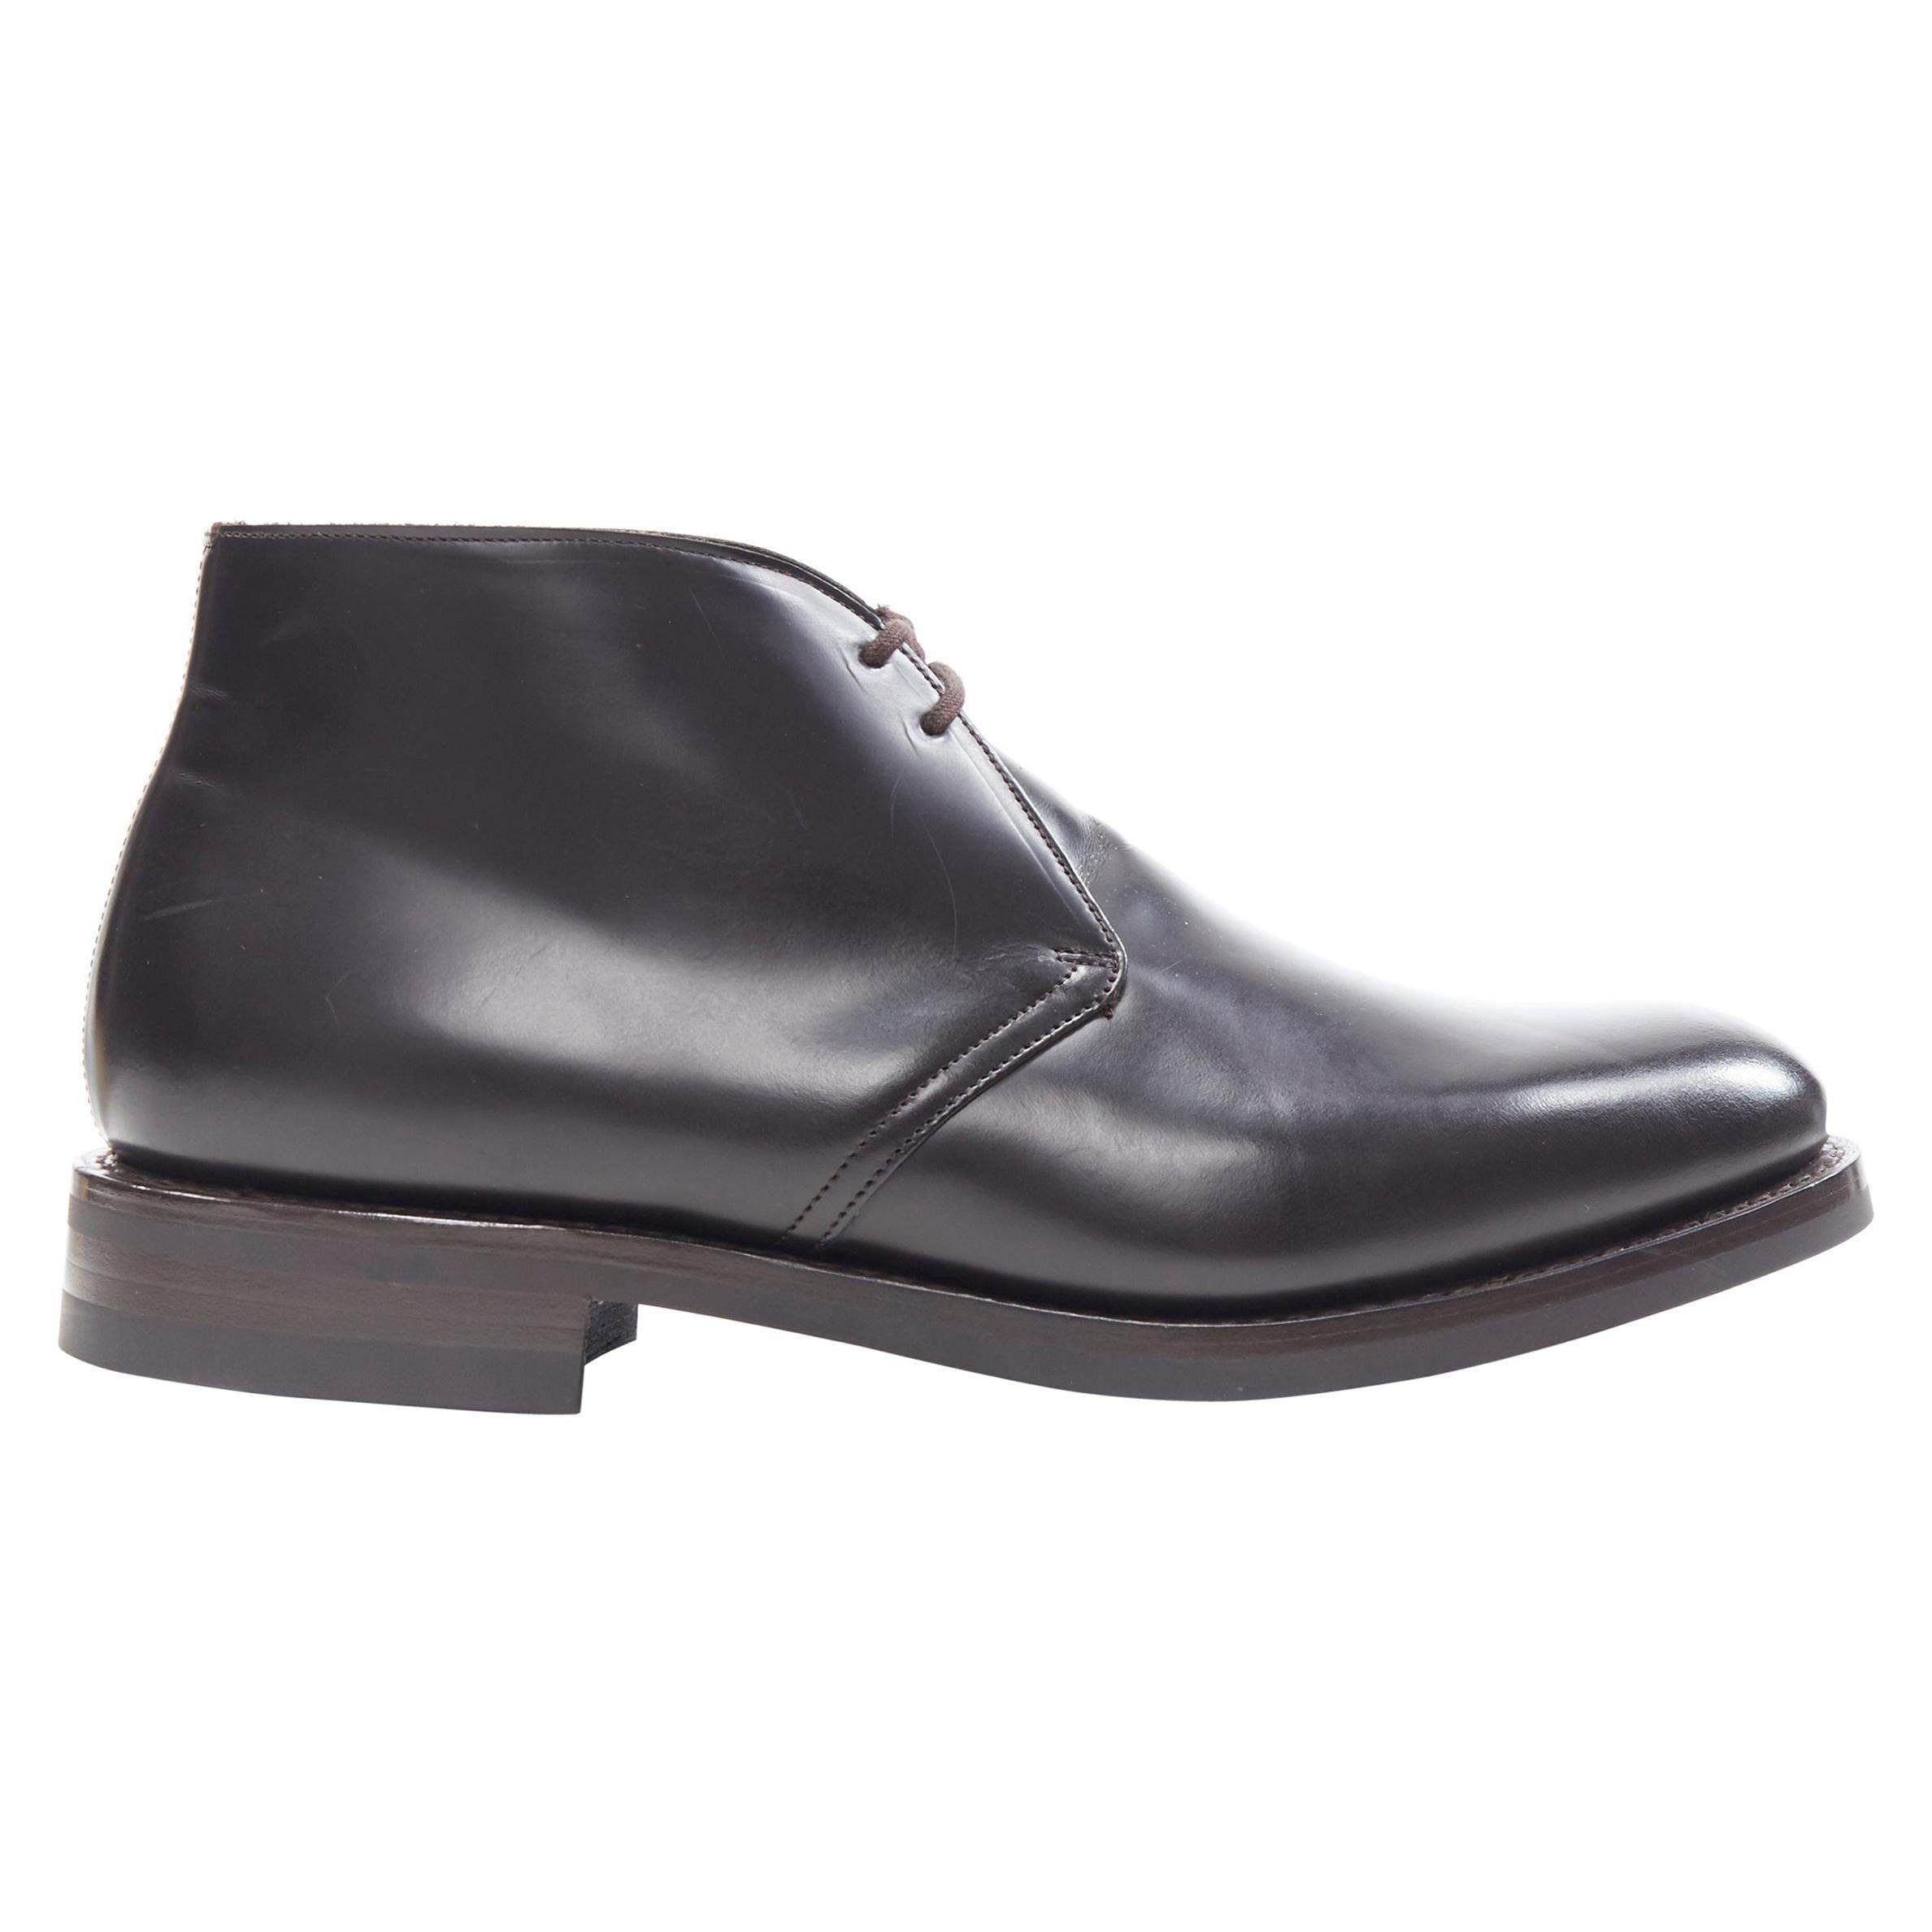 new CHURCH'S Ryder 3 Ebony Bright Calf dark brown leather desert boots UK10 US11